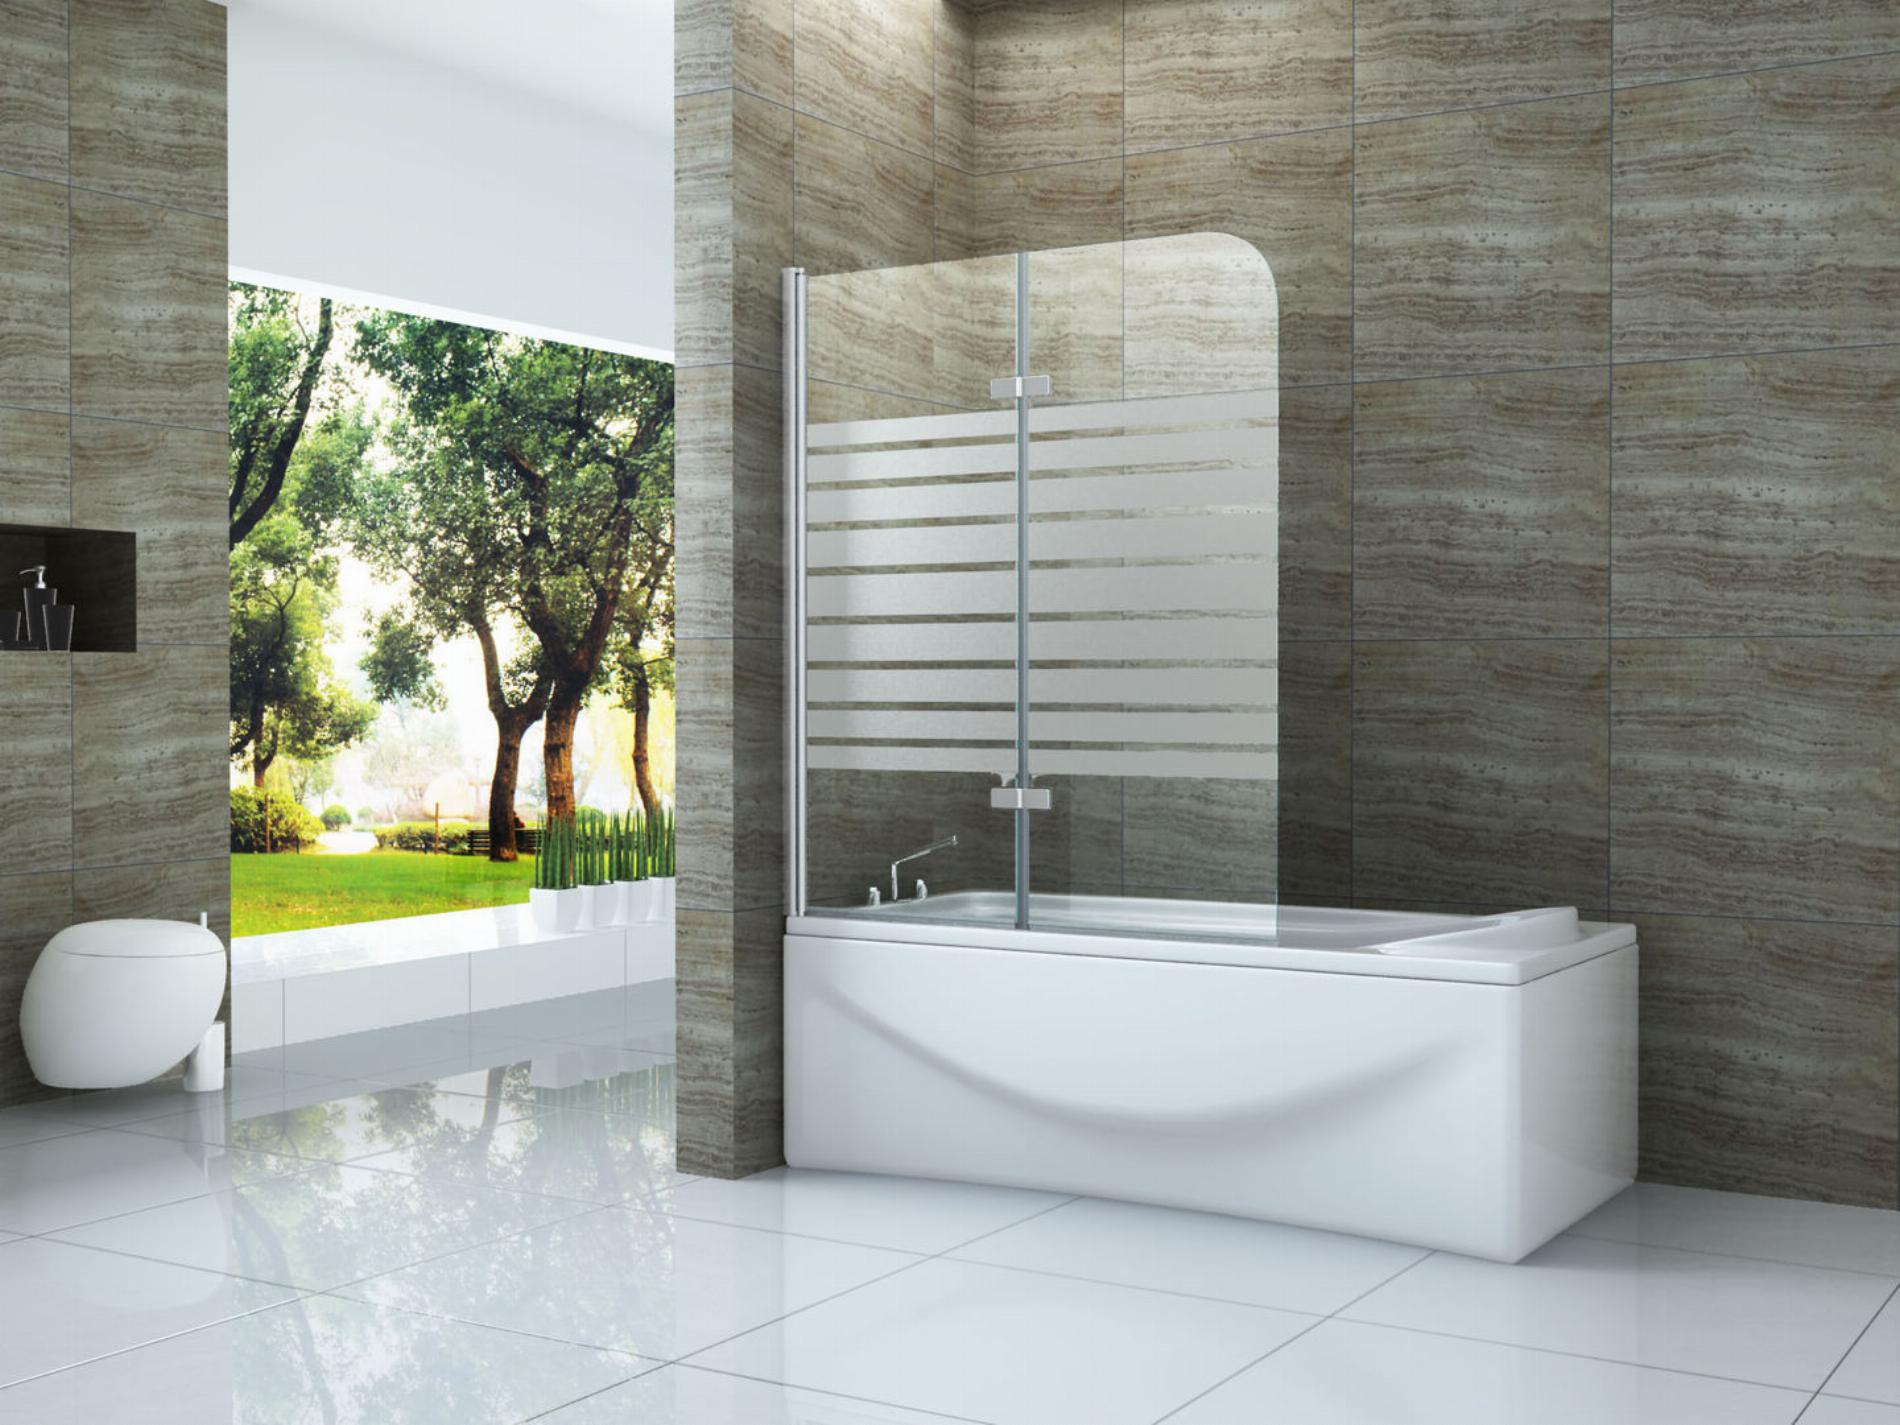 Duschtrennwand DUO-STRIPES (Badewanne)